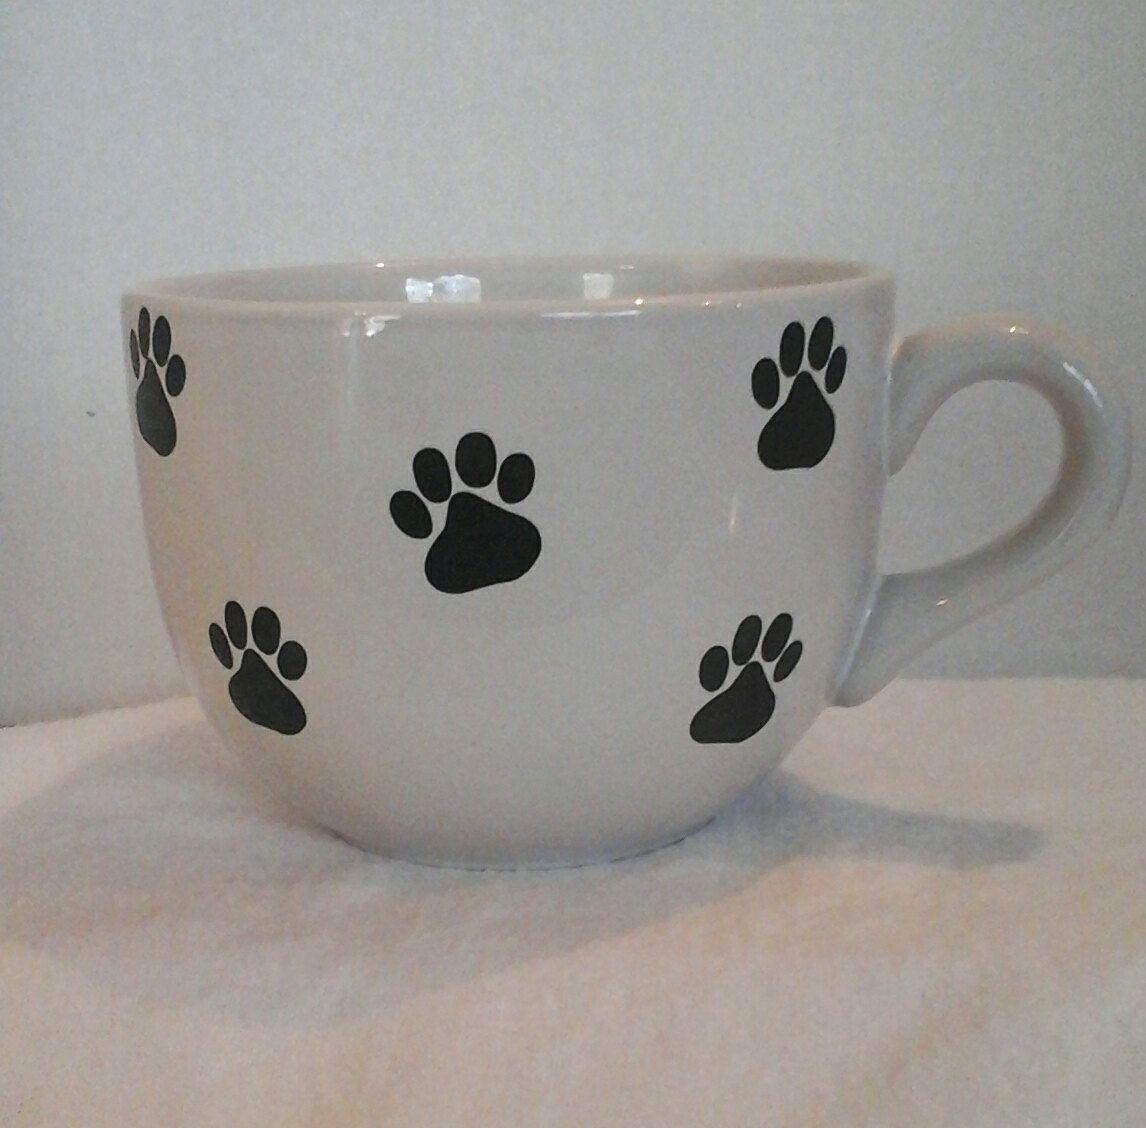 Adorable Puppy Paw Print Coffee / Hot Chocolate Cup / Mug